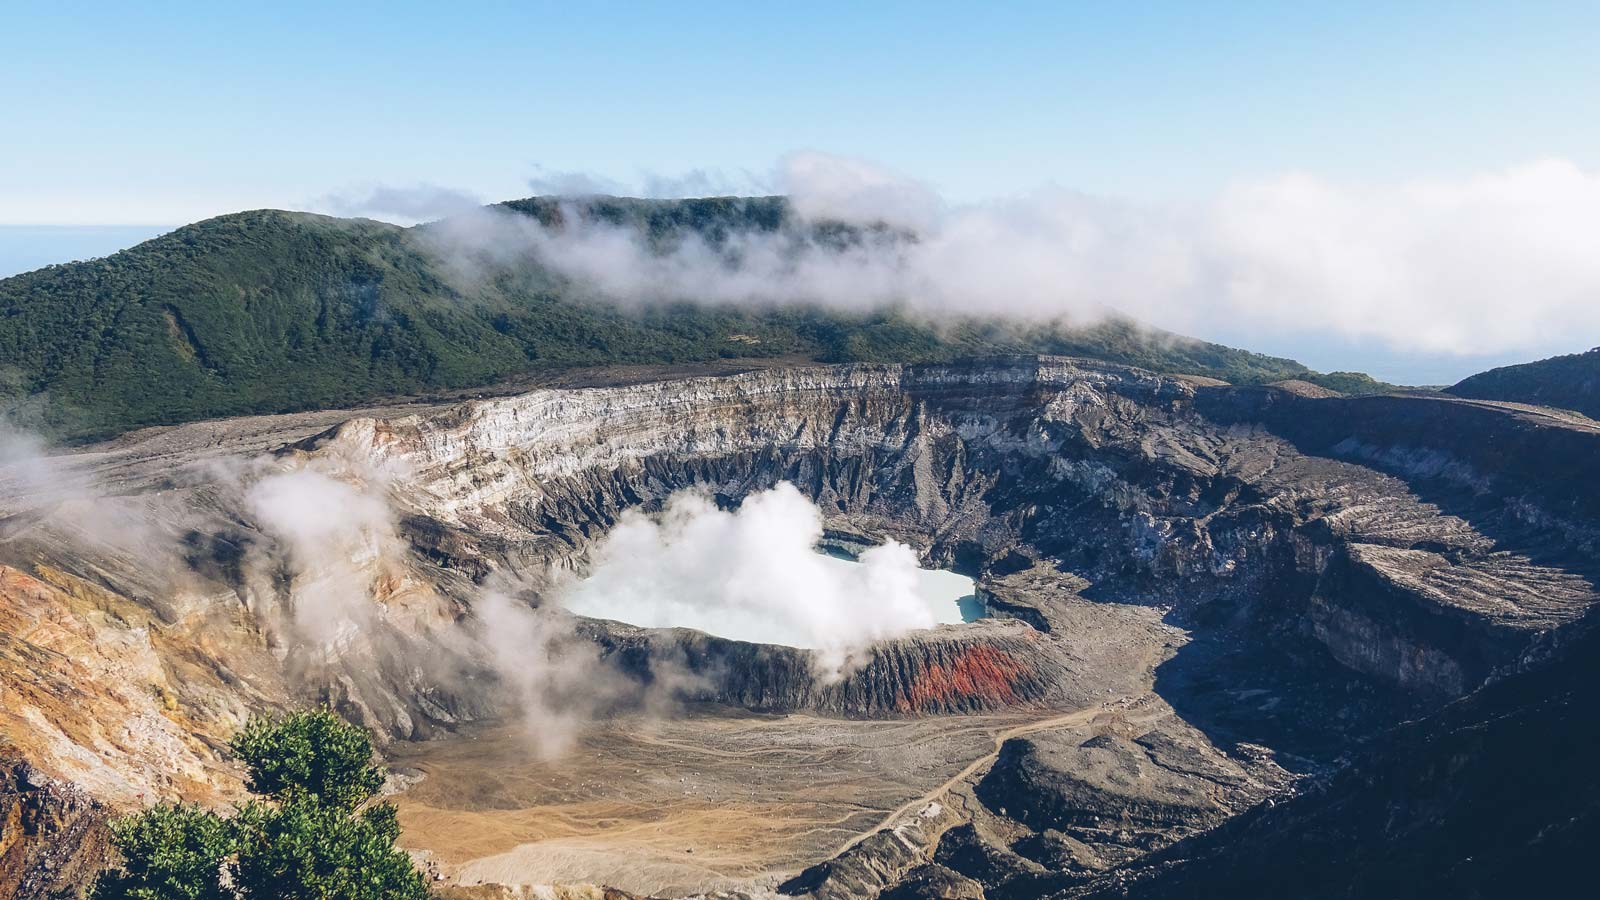 Volcan Poas, Costa Rica by Axelle et Selim/MonPremierTourDuMonde.com